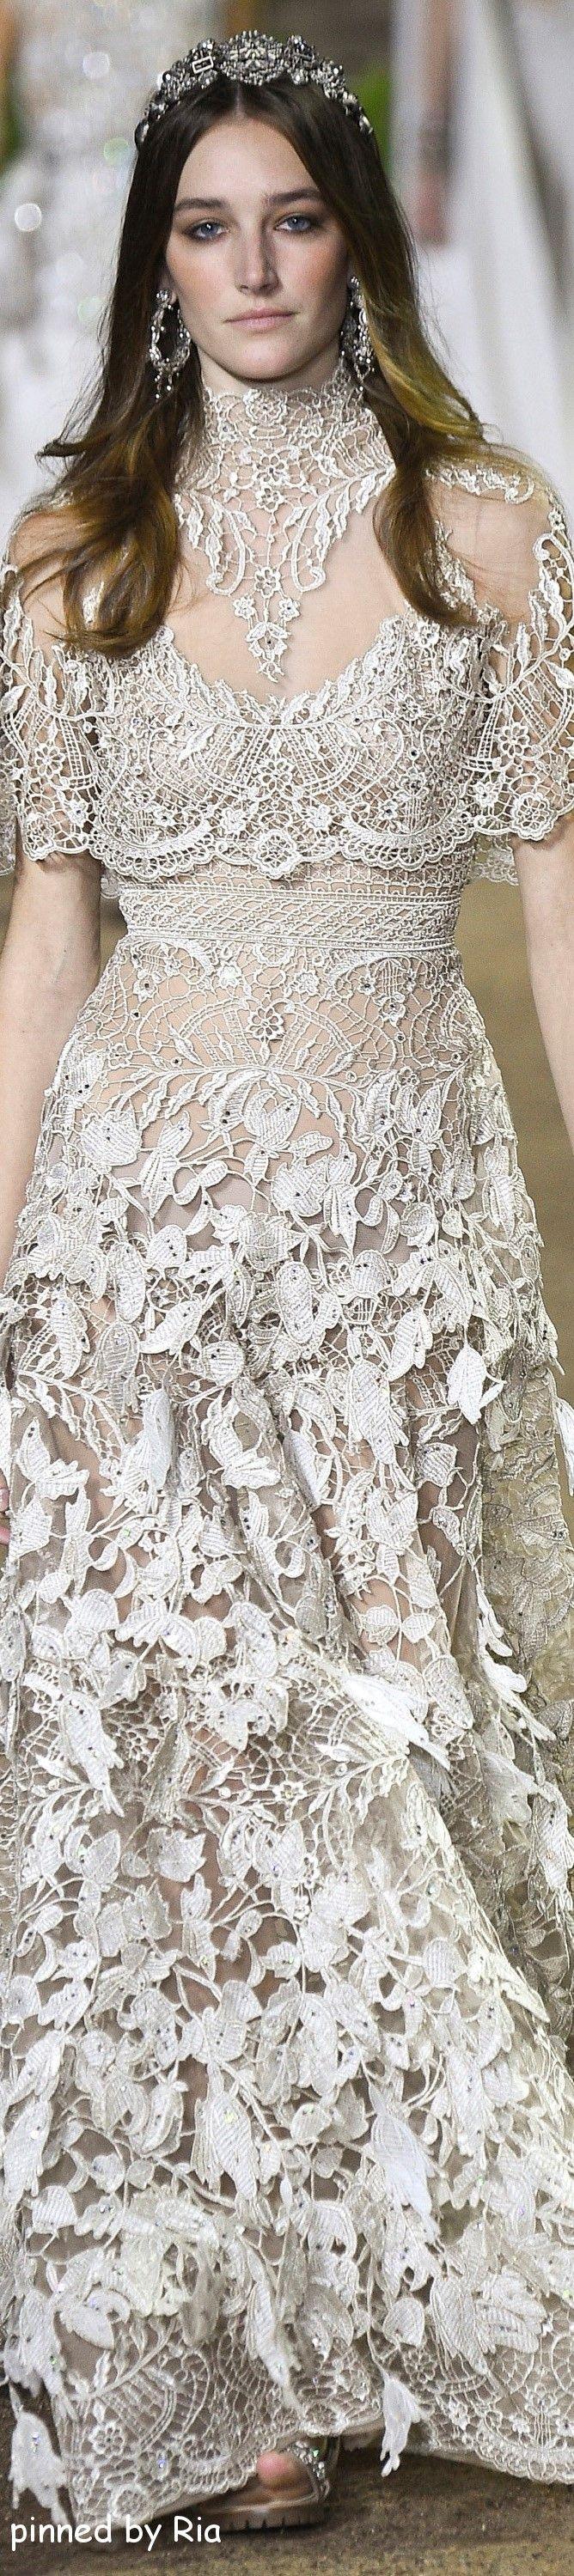 Elie Saab Spring 2016 Couture l Ria jαɢlαdy